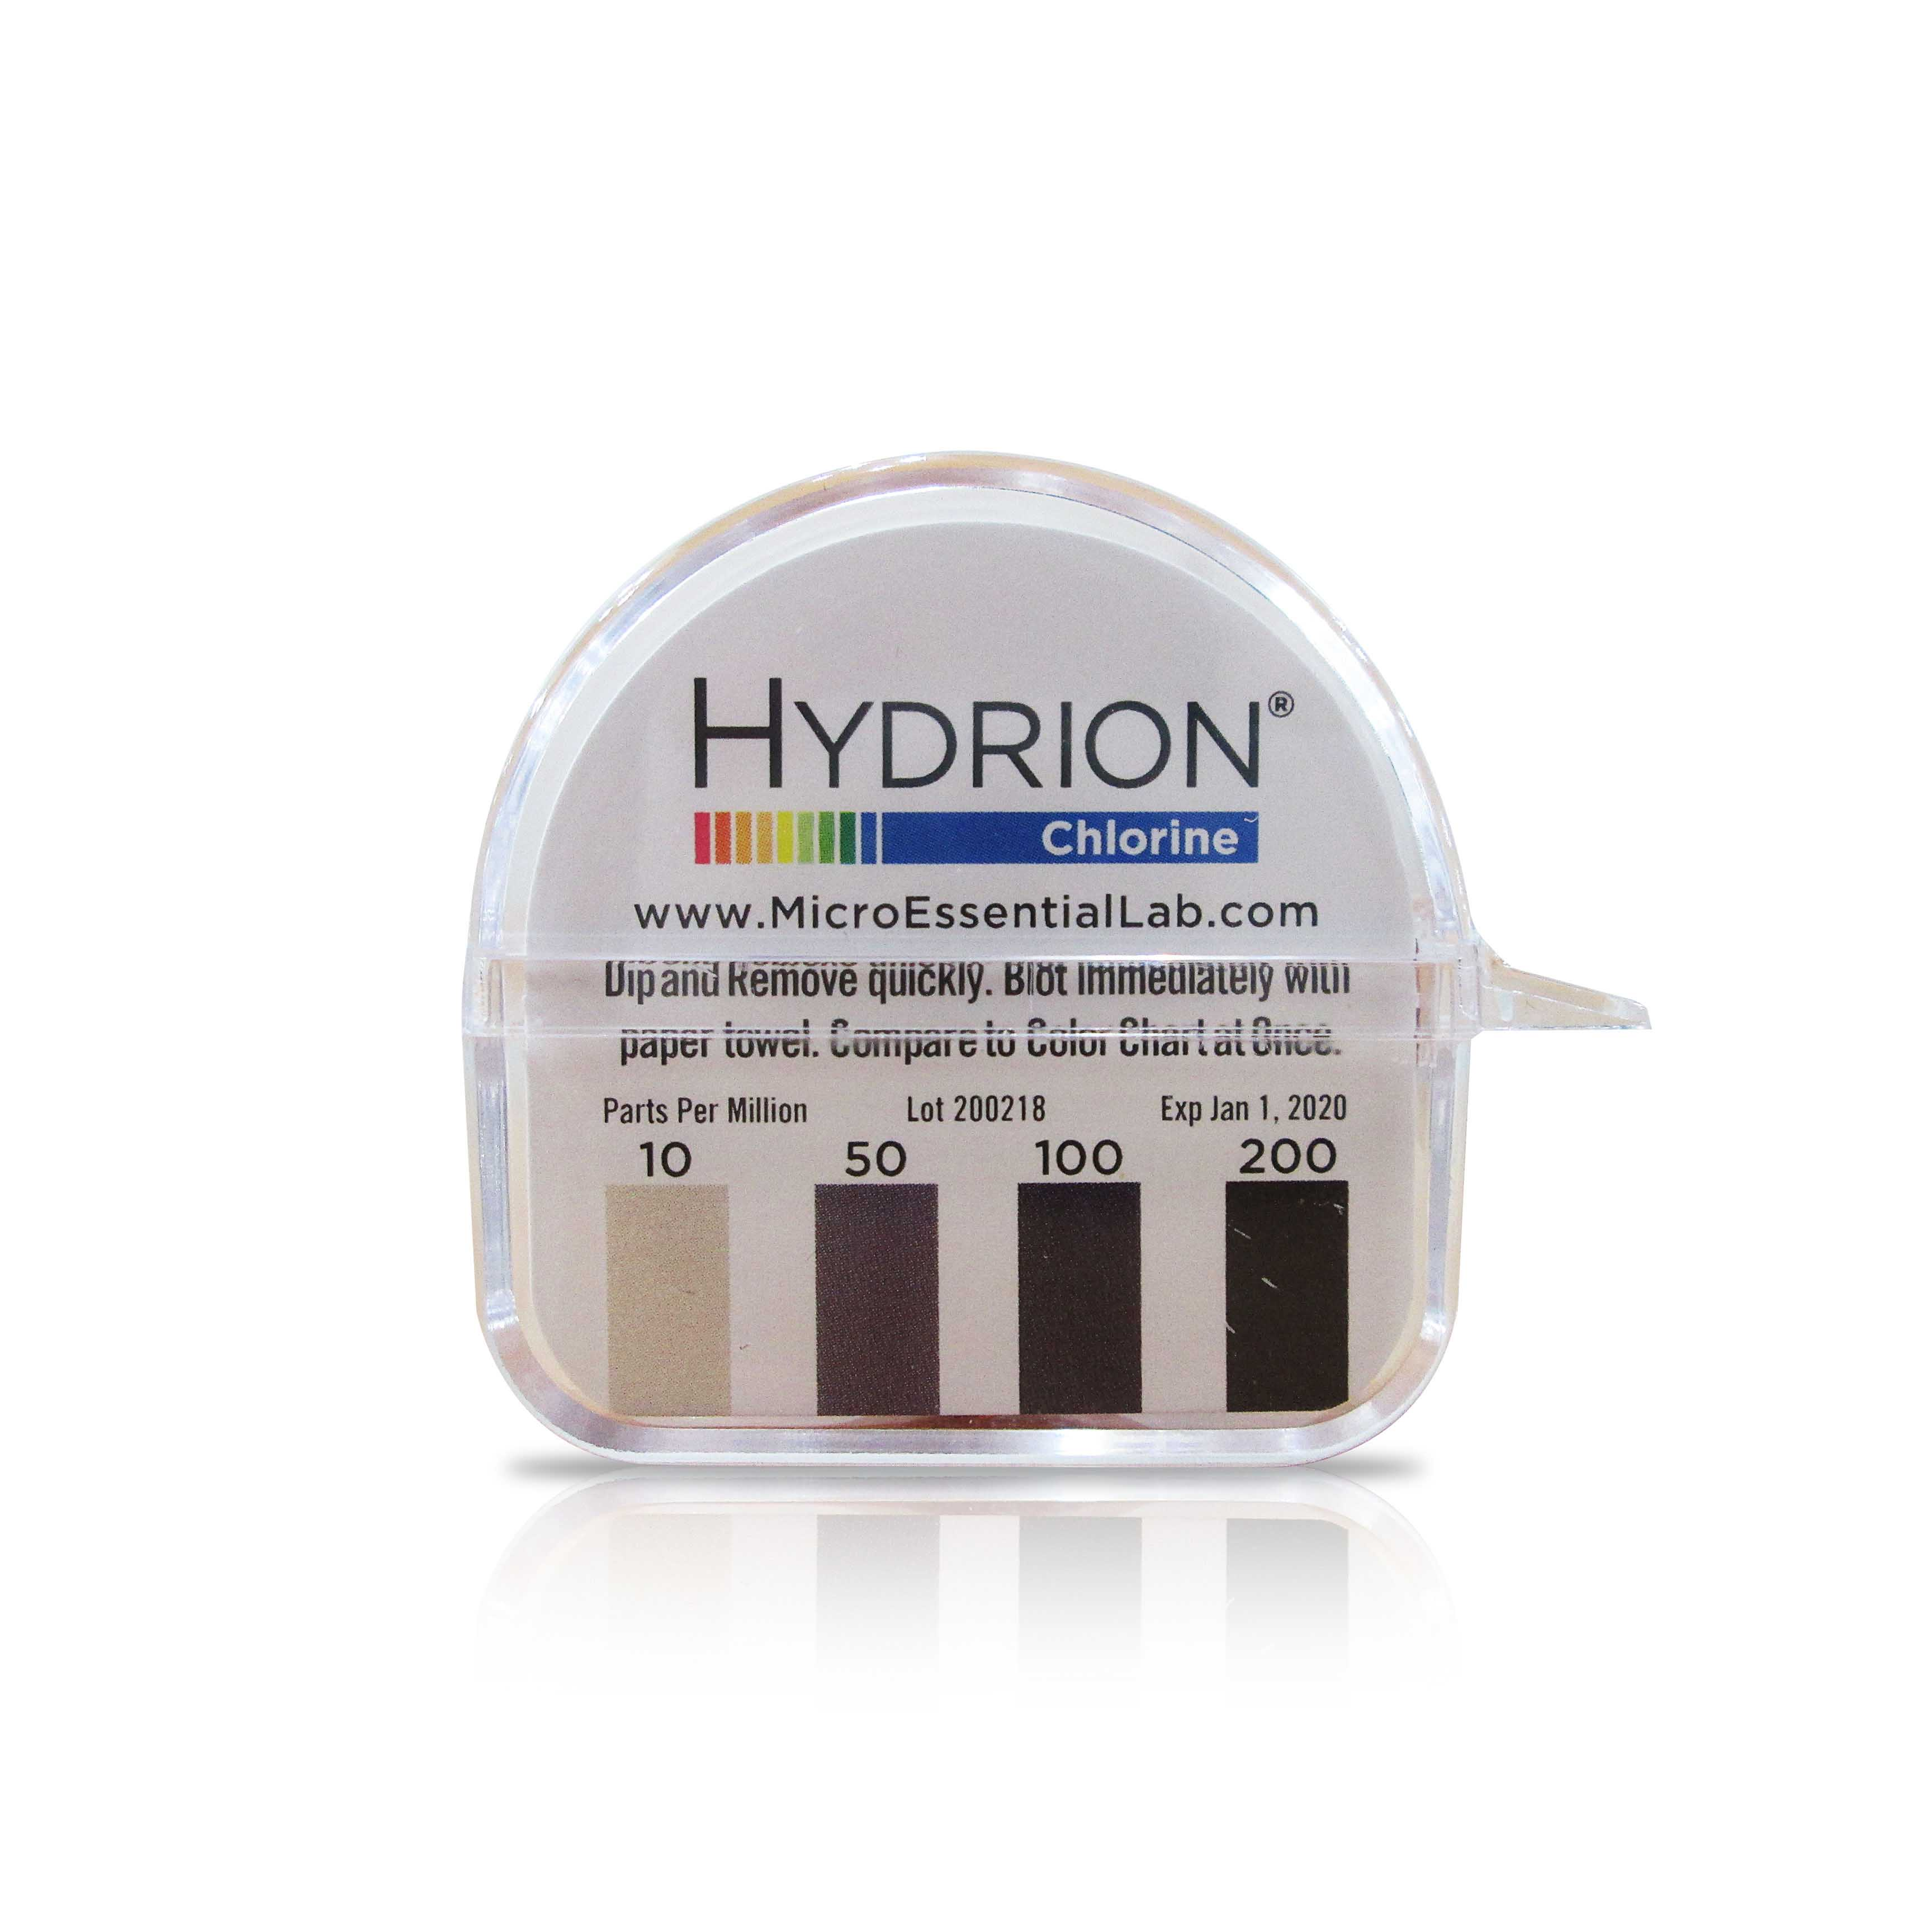 Hydrion chlorine